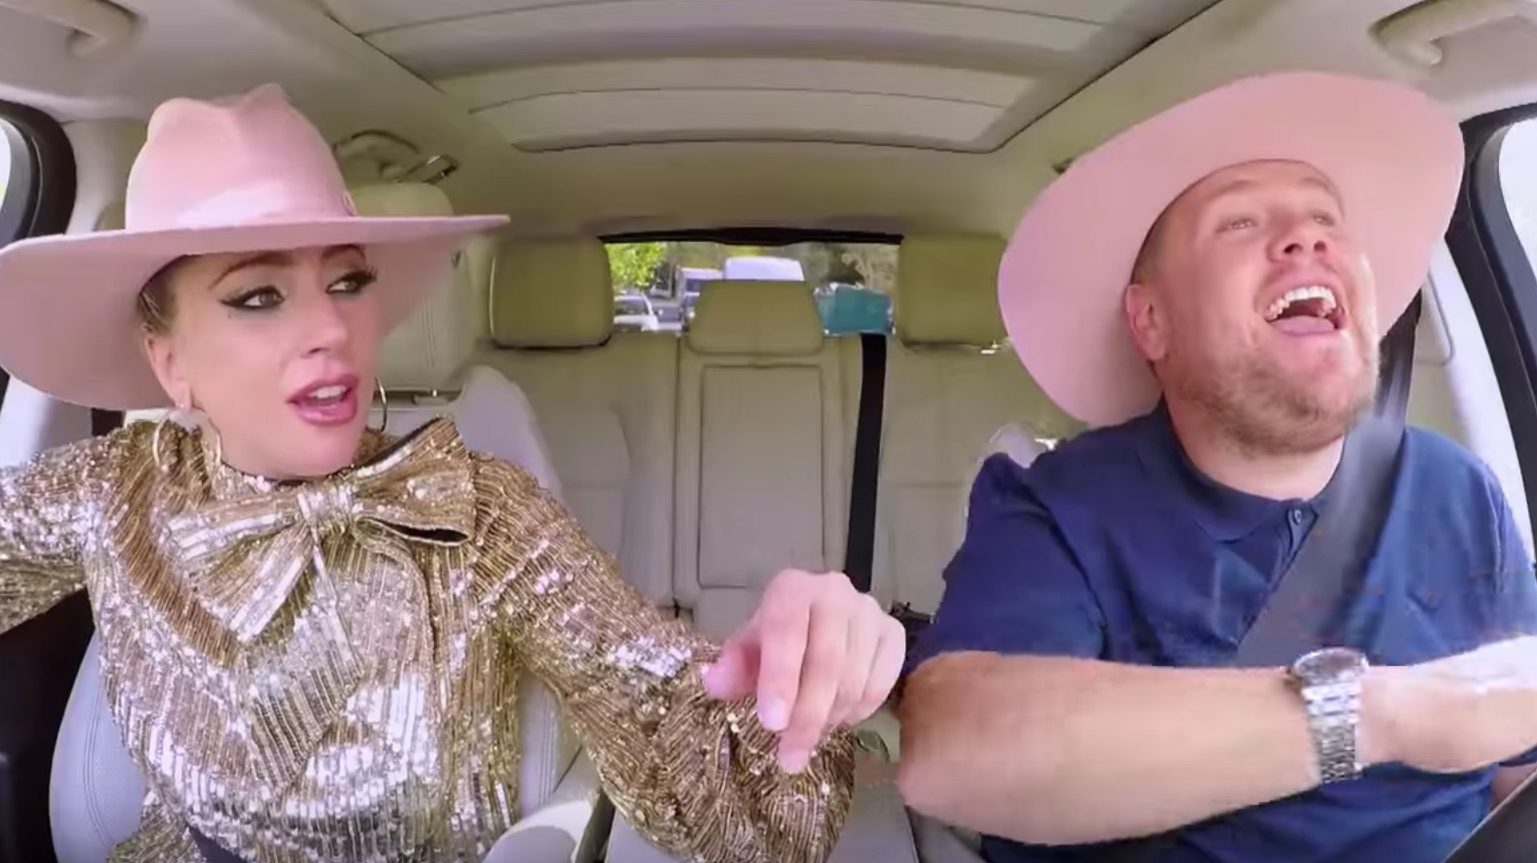 James Corden's Emmy-Winning 'Carpool Karaoke' Nabs Lady Gaga